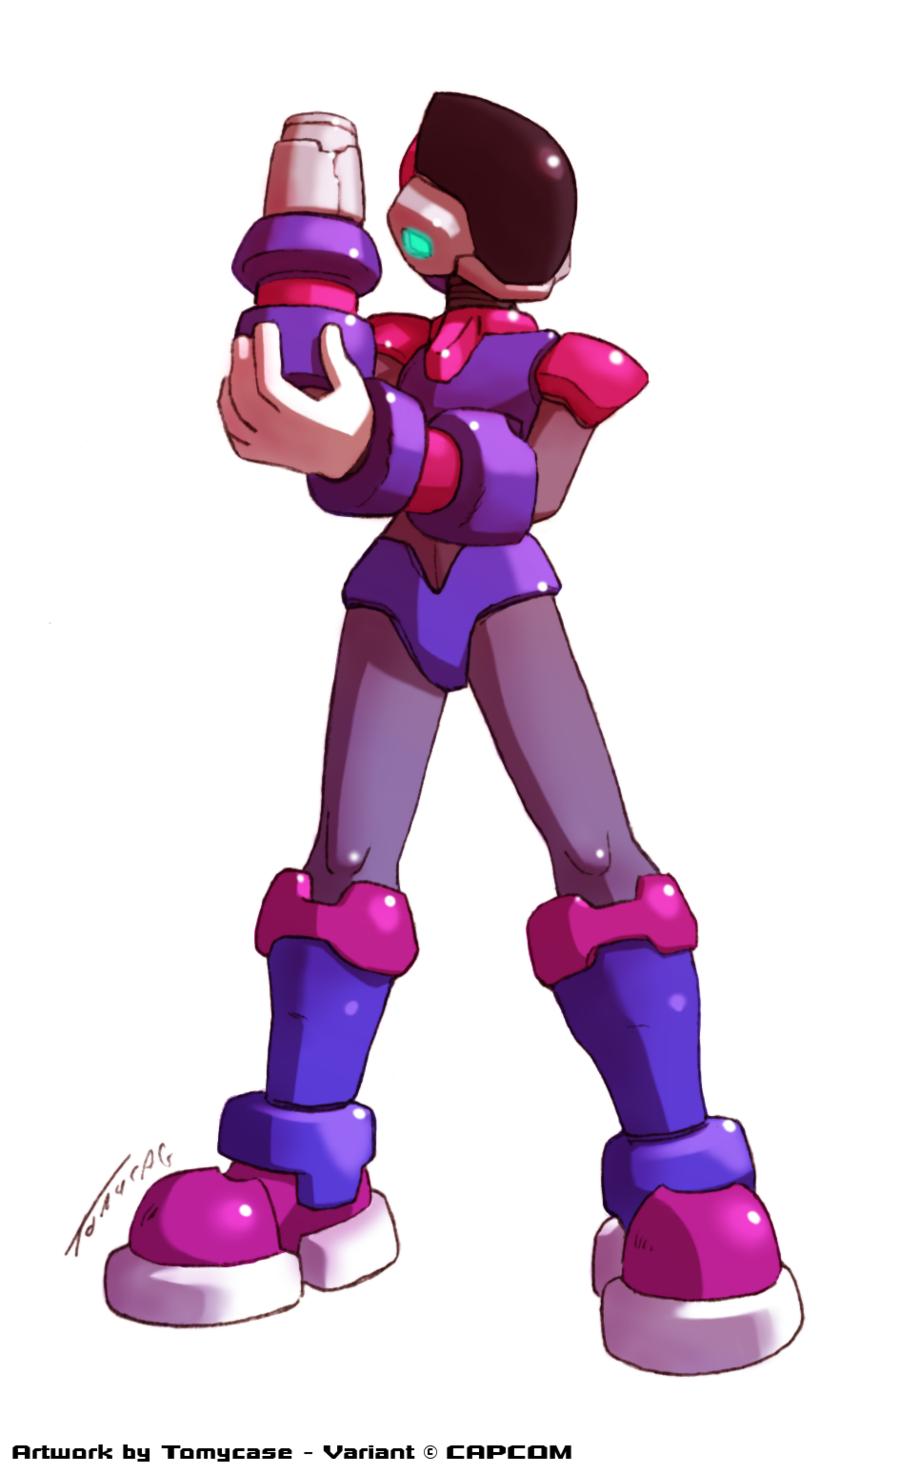 Omega Zero Gunvolt Style By Tomycase On Deviantart Mega Man Art Capcom Art Character Design